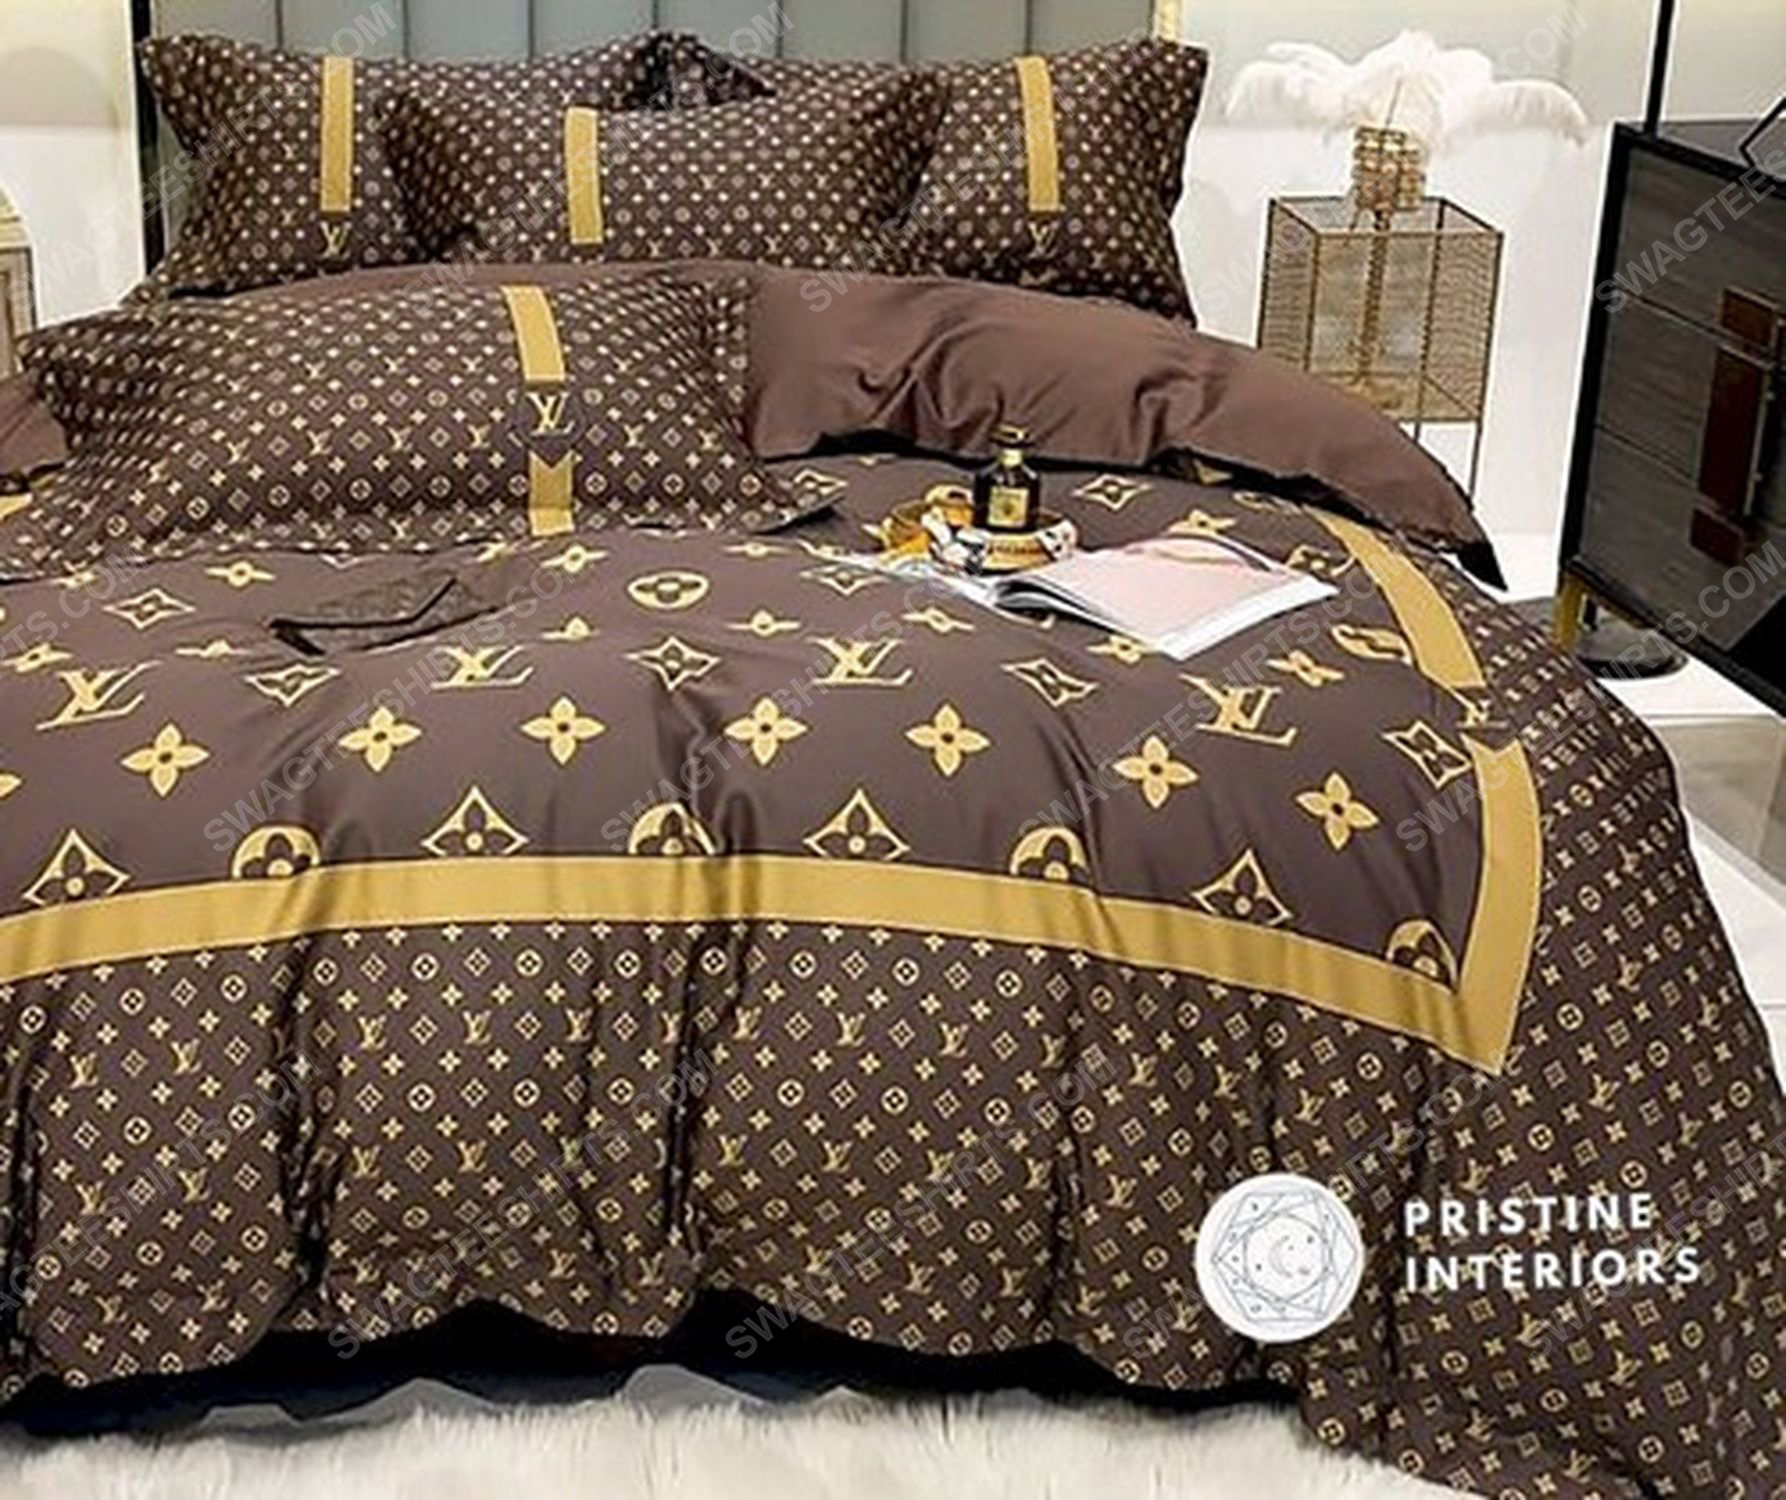 Lv monogram brown version full print duvet cover bedding set 2 - Copy